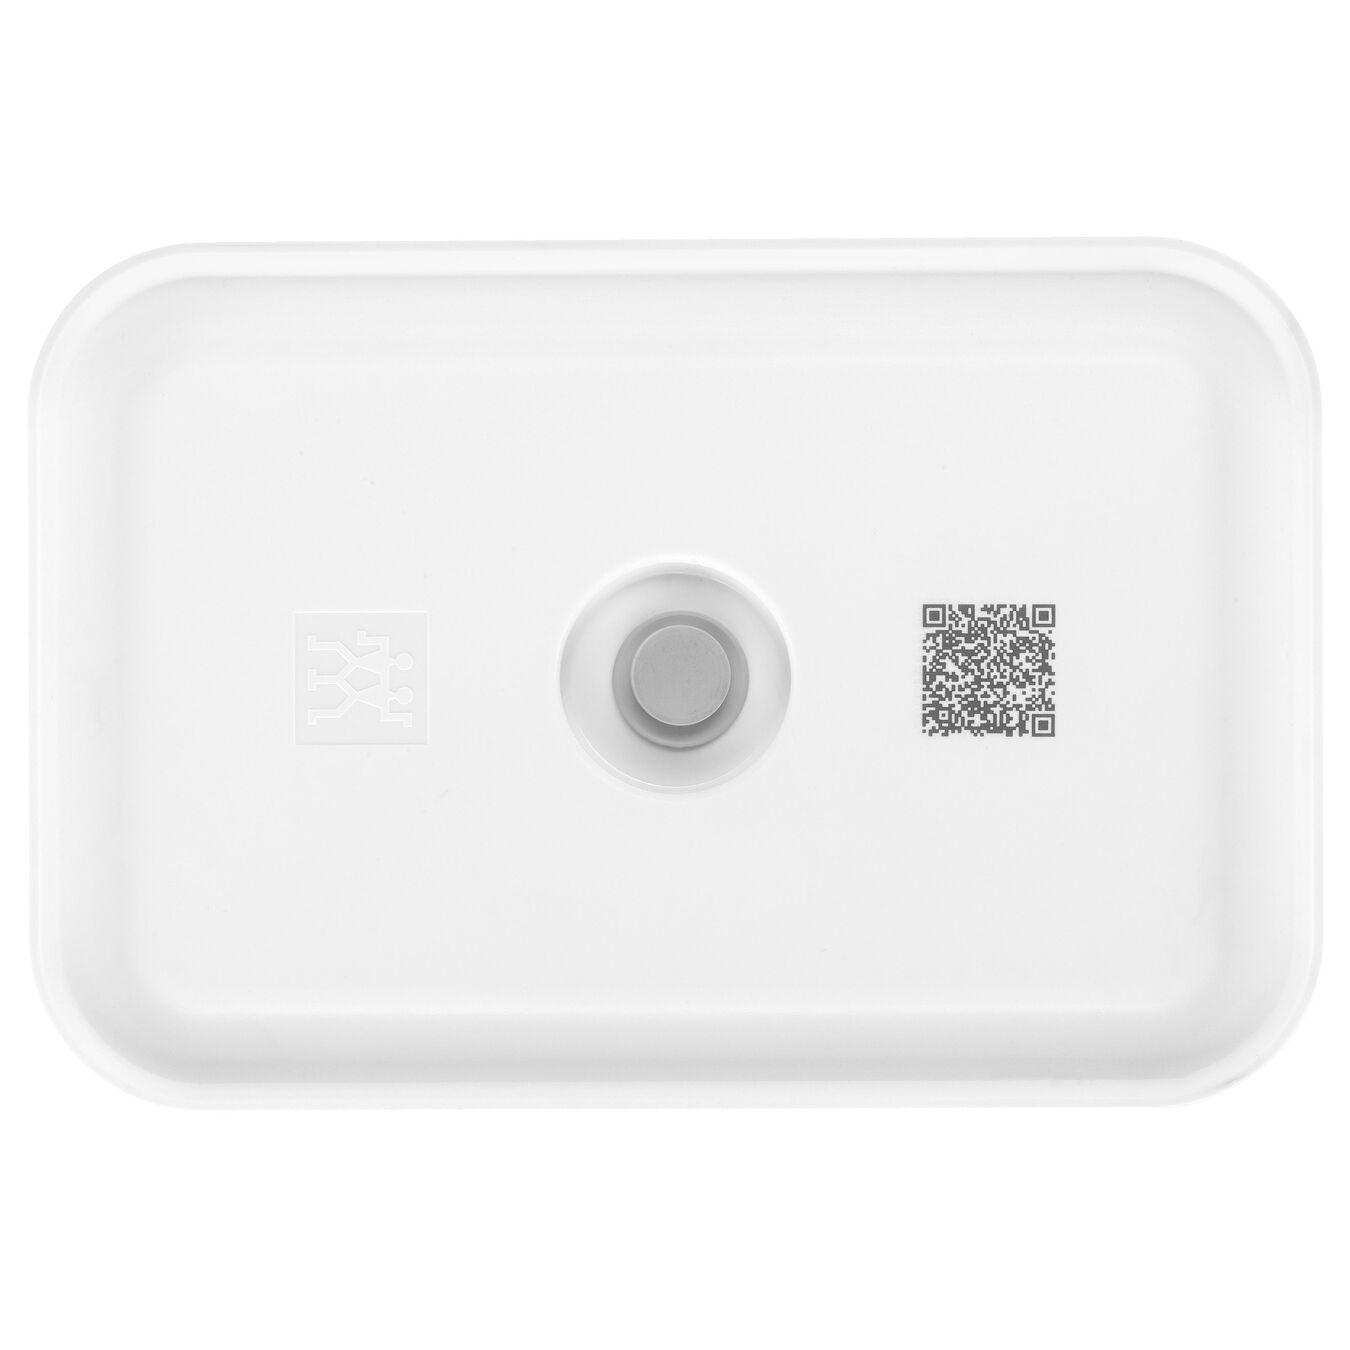 Vakuum Lunchbox, L, Kunststoff, Weiß,,large 2